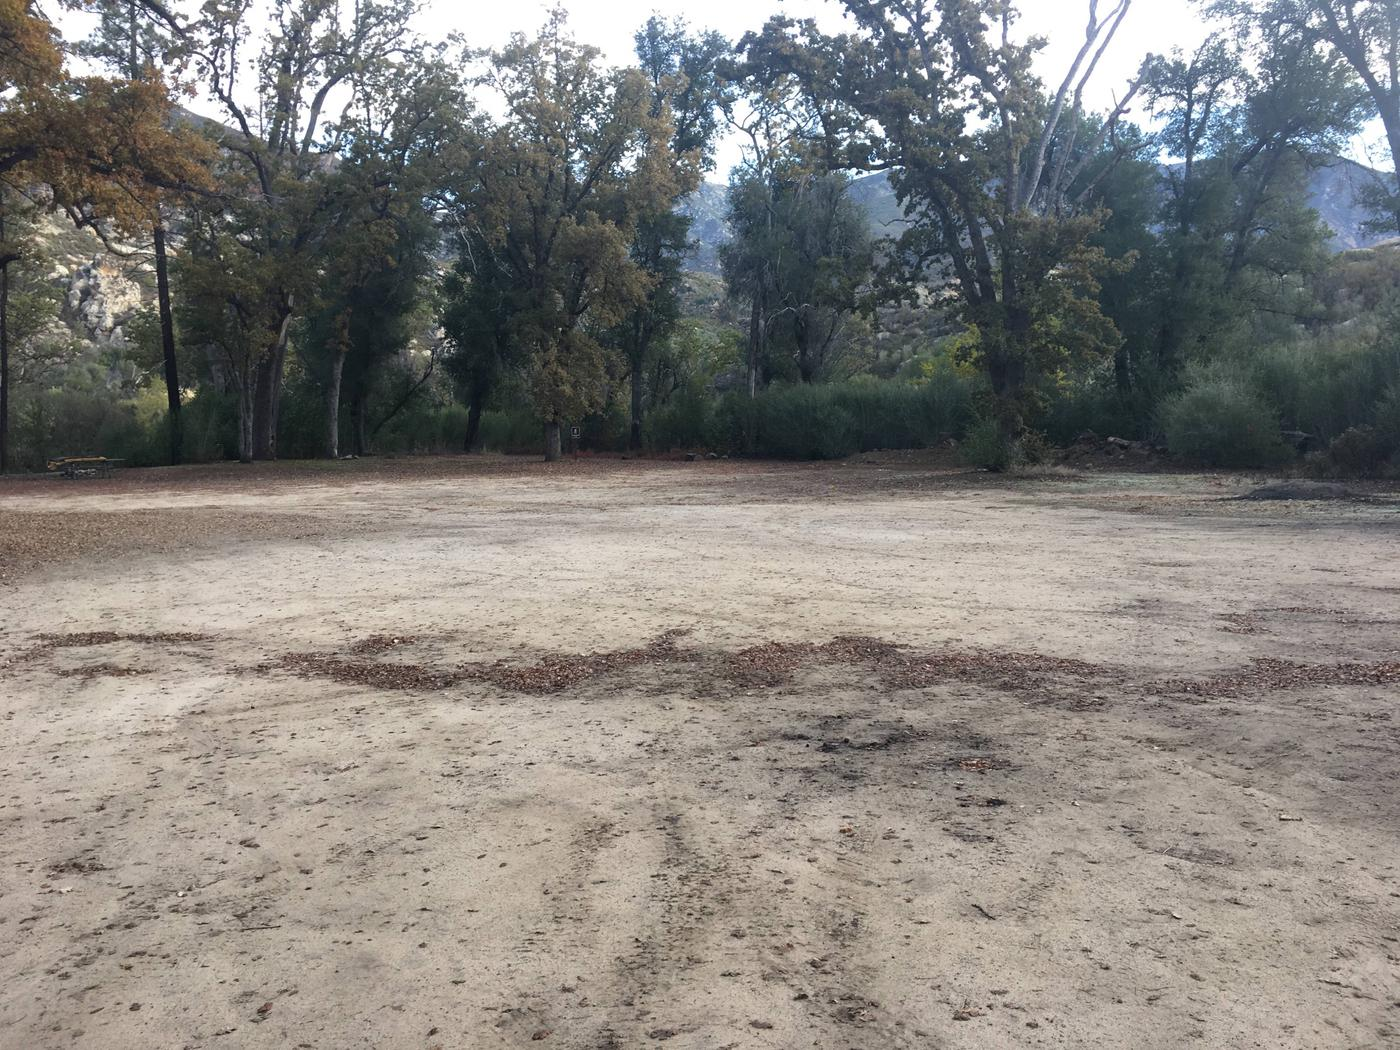 Memorial Campground Site 1